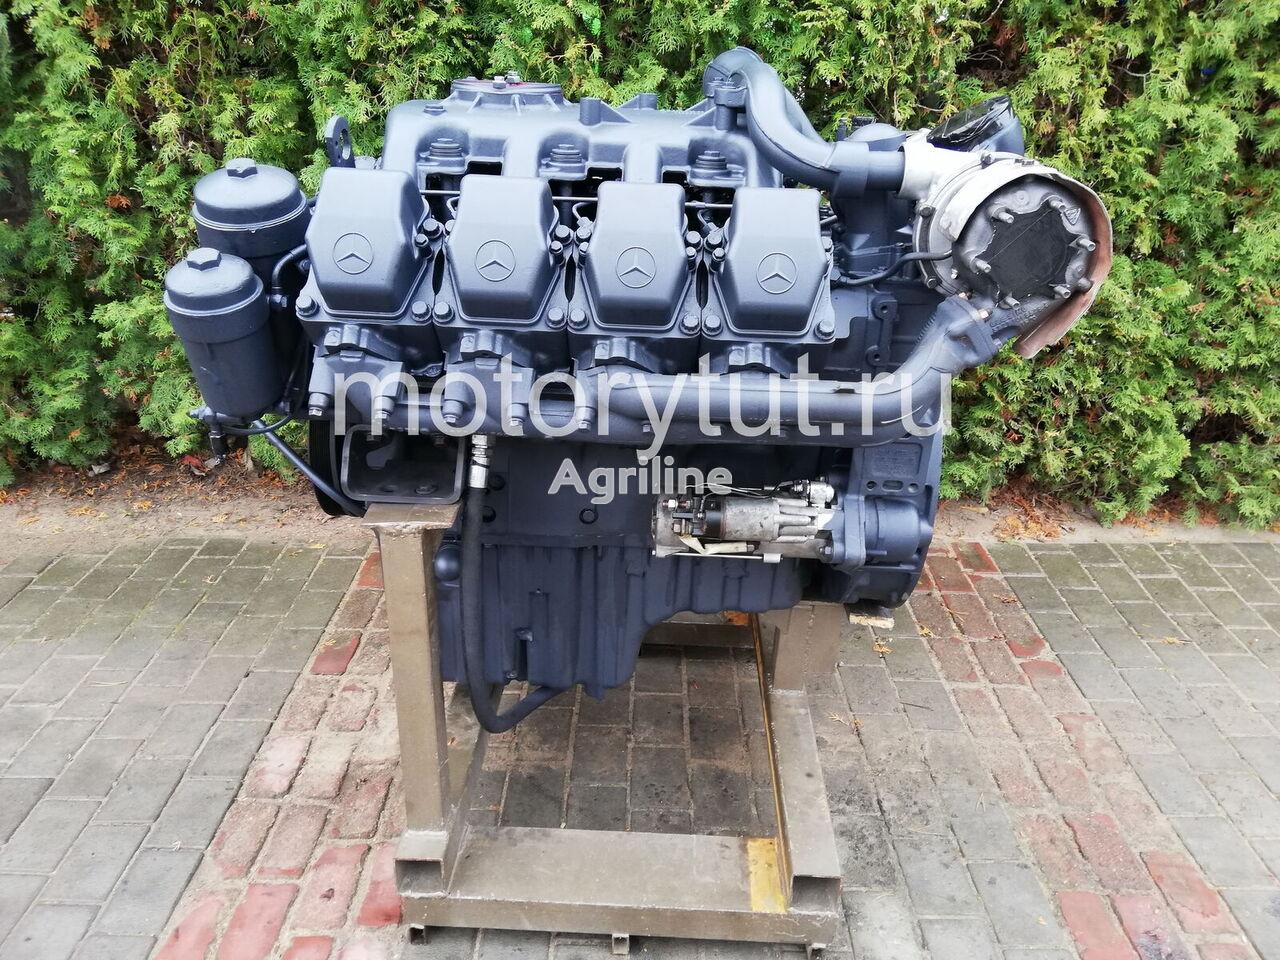 new MERCEDES-BENZ OM 502 LA (942.992) engine for CLAAS Jaguar grain harvester